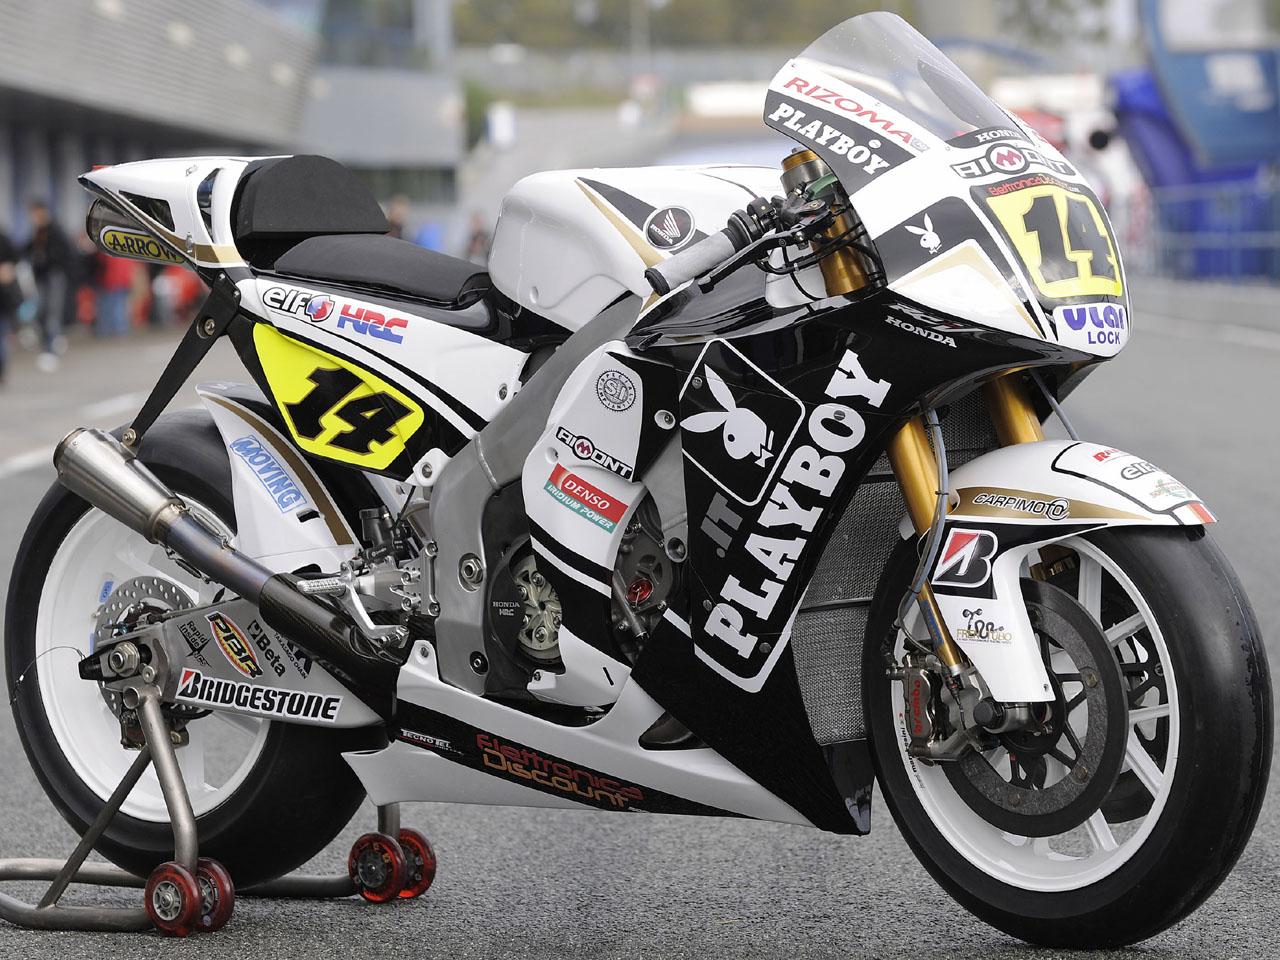 Honda Racing Moto Gp: Moto Gp Honda